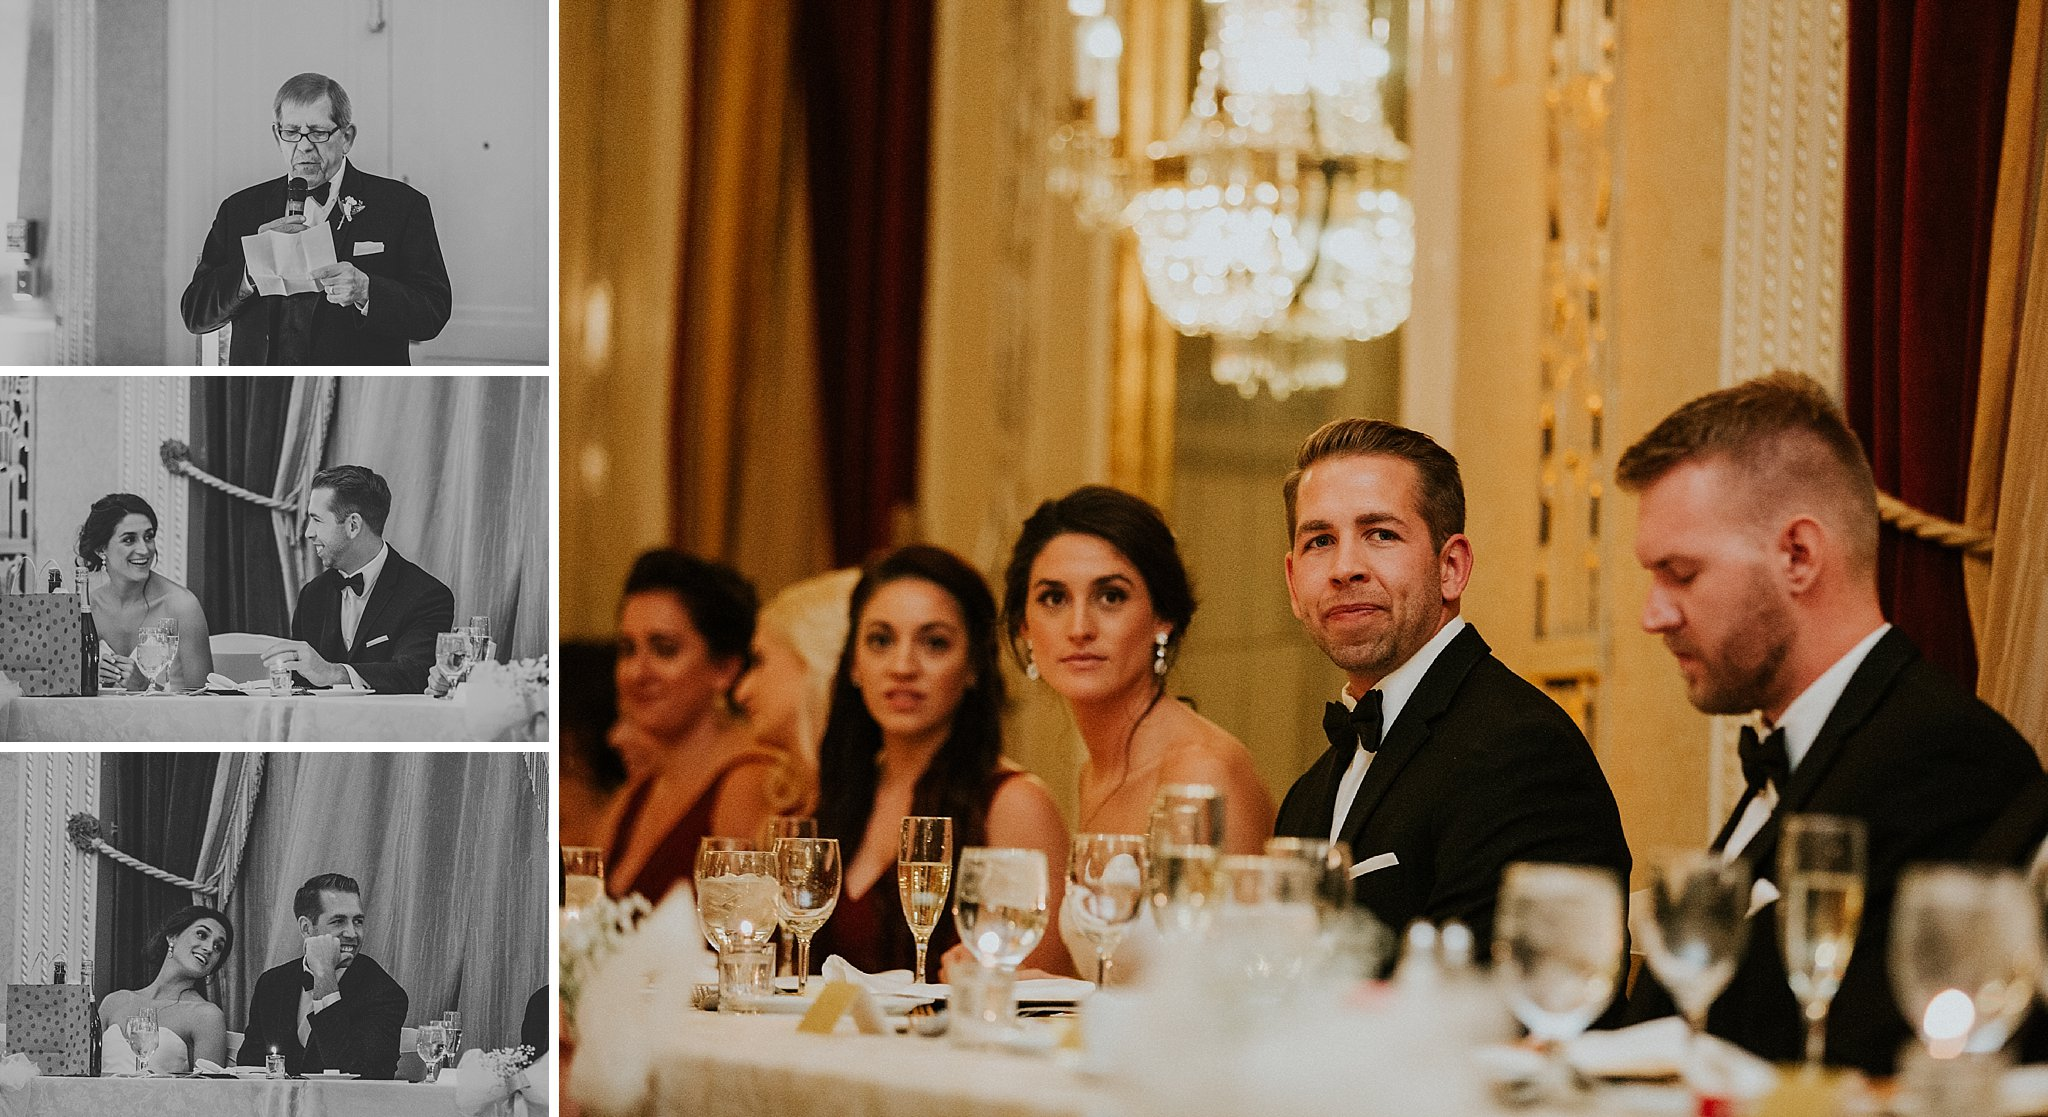 Matt-Lauren_St-Marys_Hilton-City-Center-Milwaukee-Wedding_liller-photo_0072.jpg